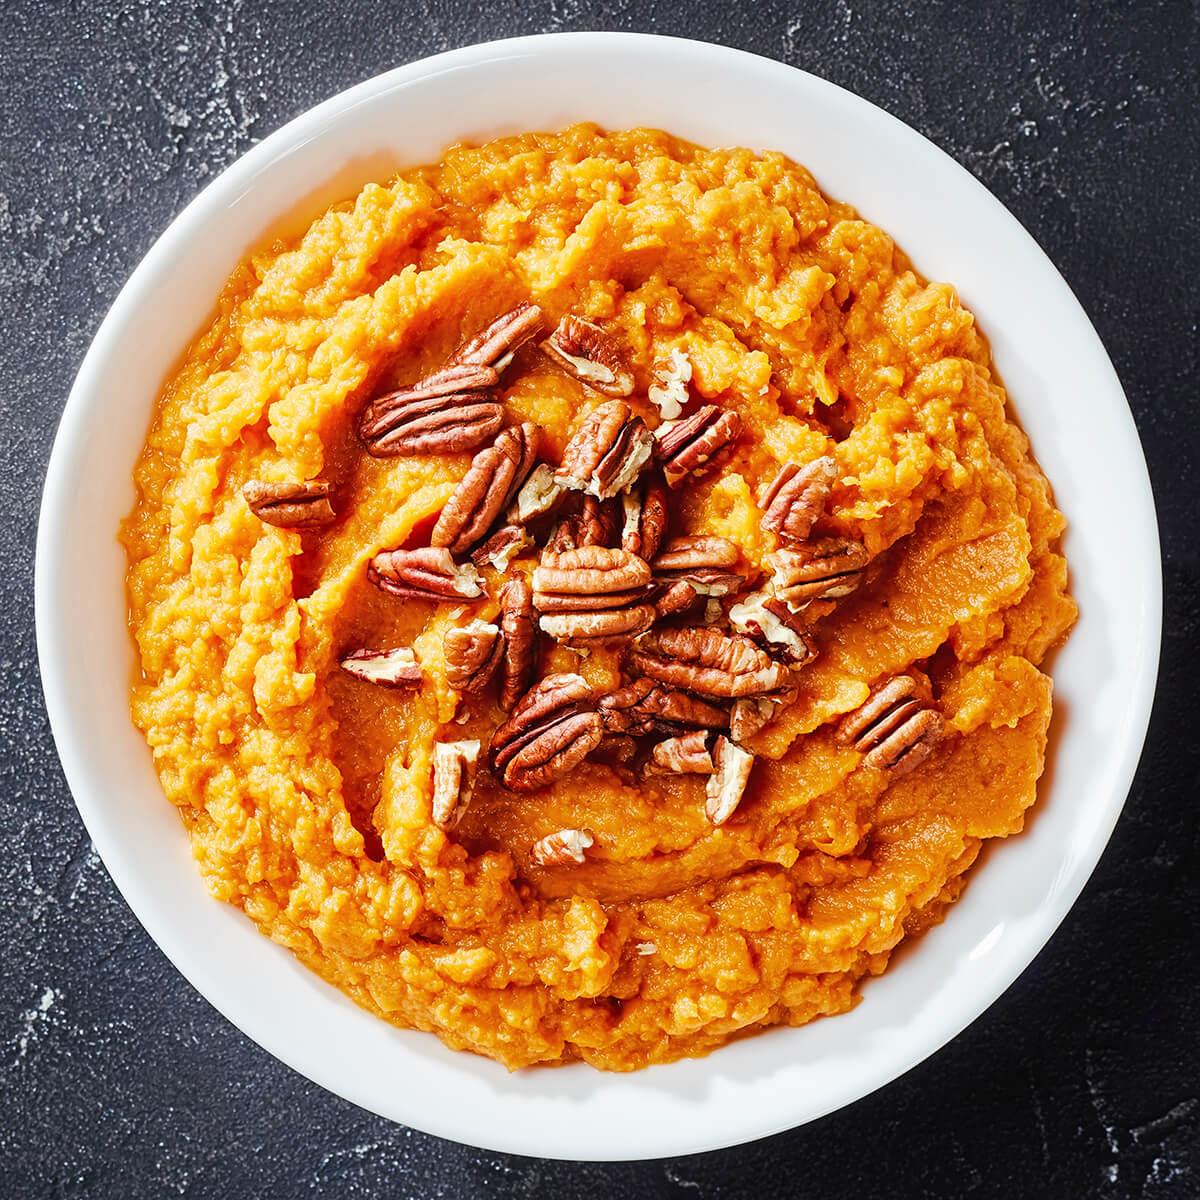 sweet potato mash is one of the 21 Best Vegan Christmas Dinner Recipes